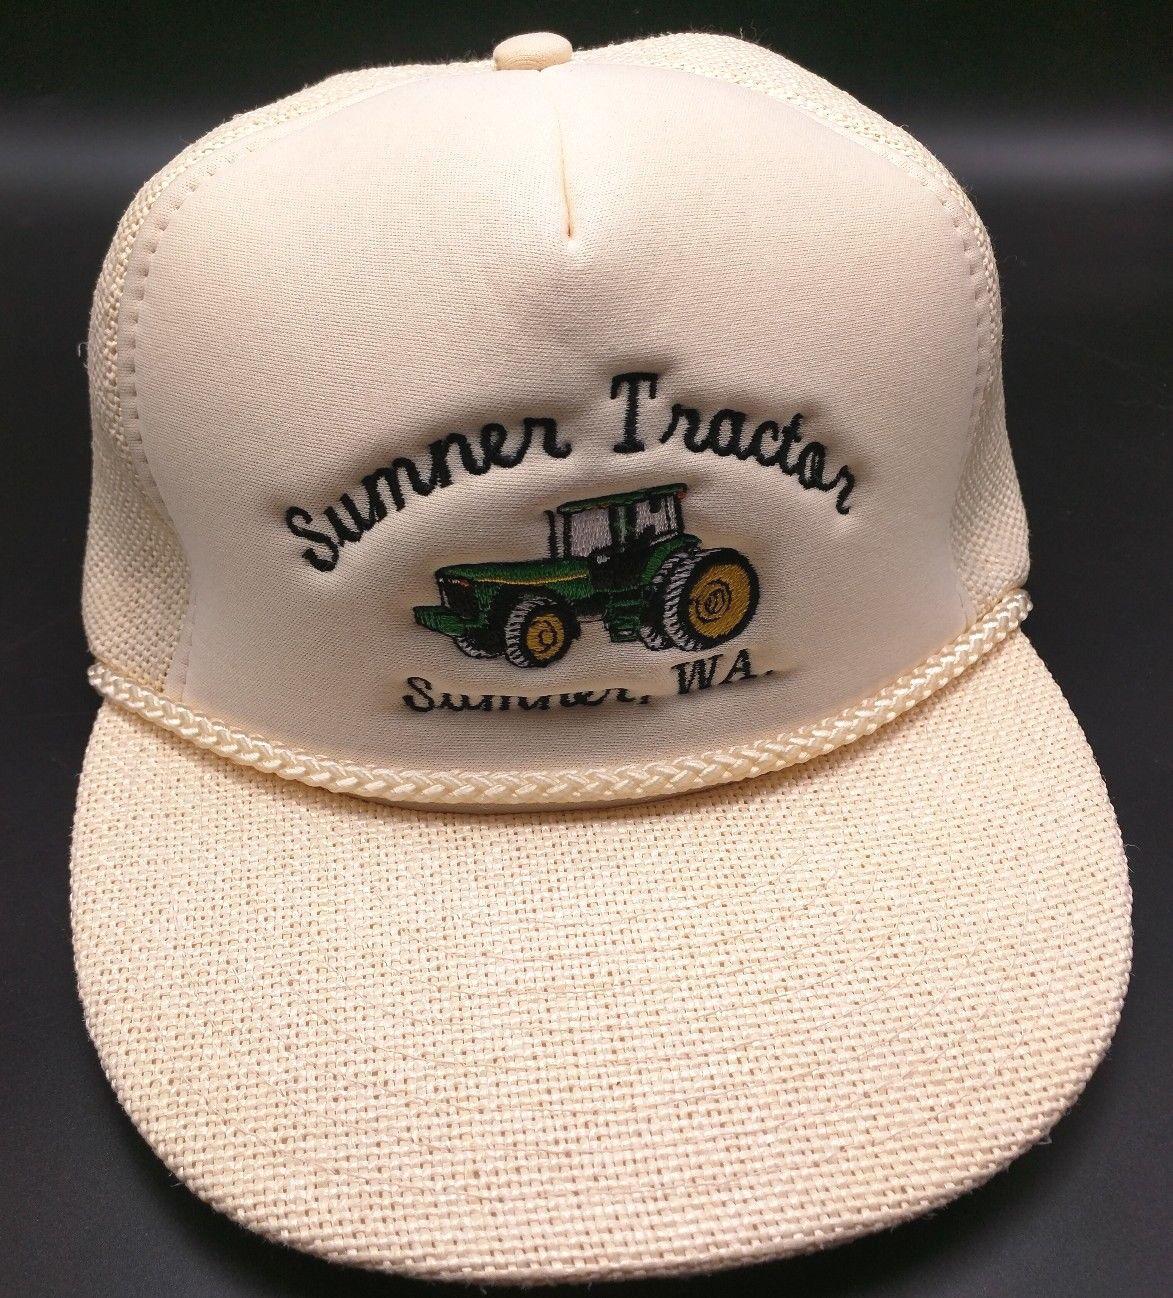 SUMNER / TRACTOR WA vintage off-white adjustable cap / SUMNER hat - flat brim 13efc0